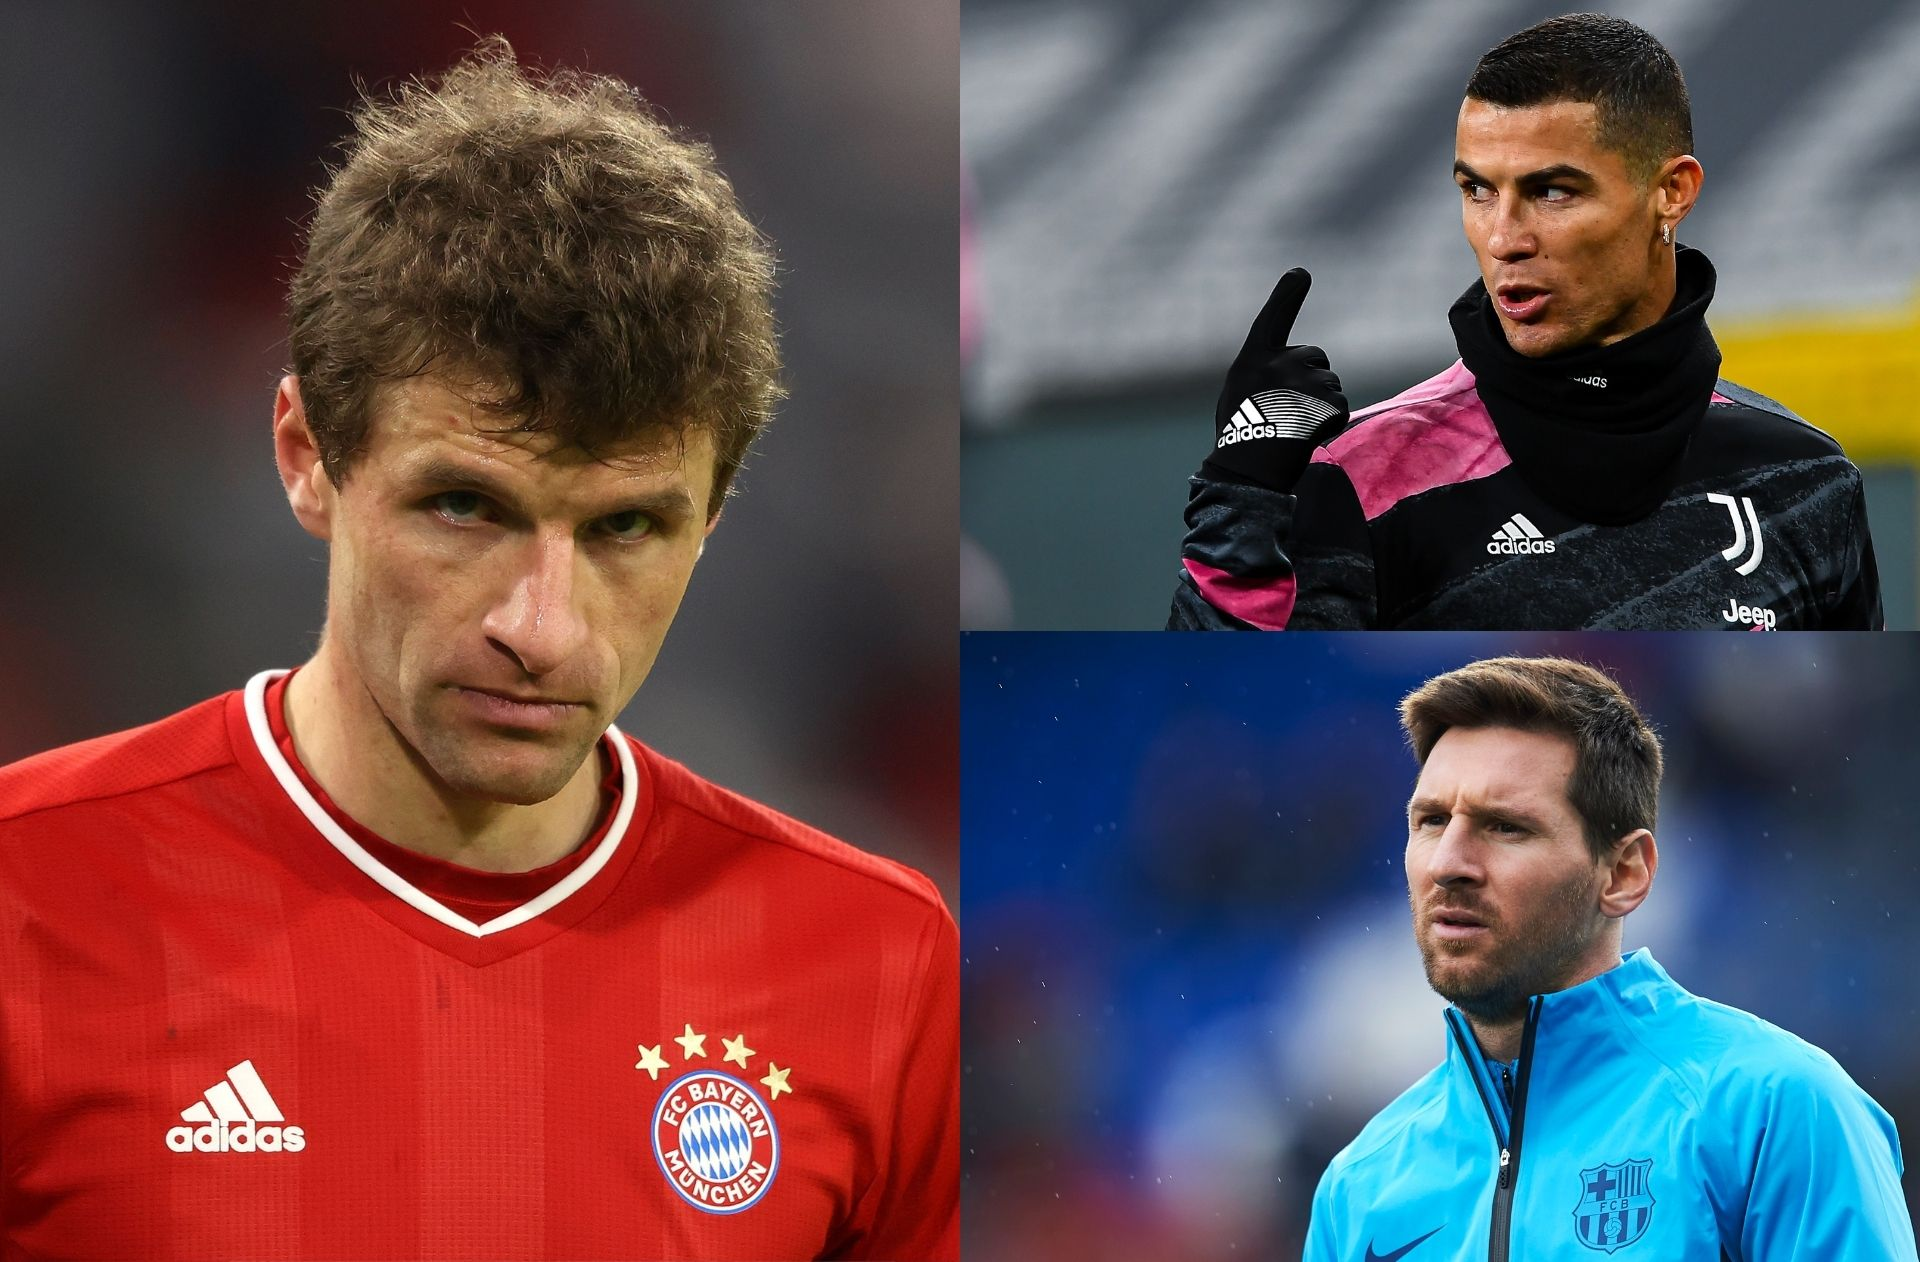 Thomas Muller, Cristiano Ronaldo, Lionel Messi